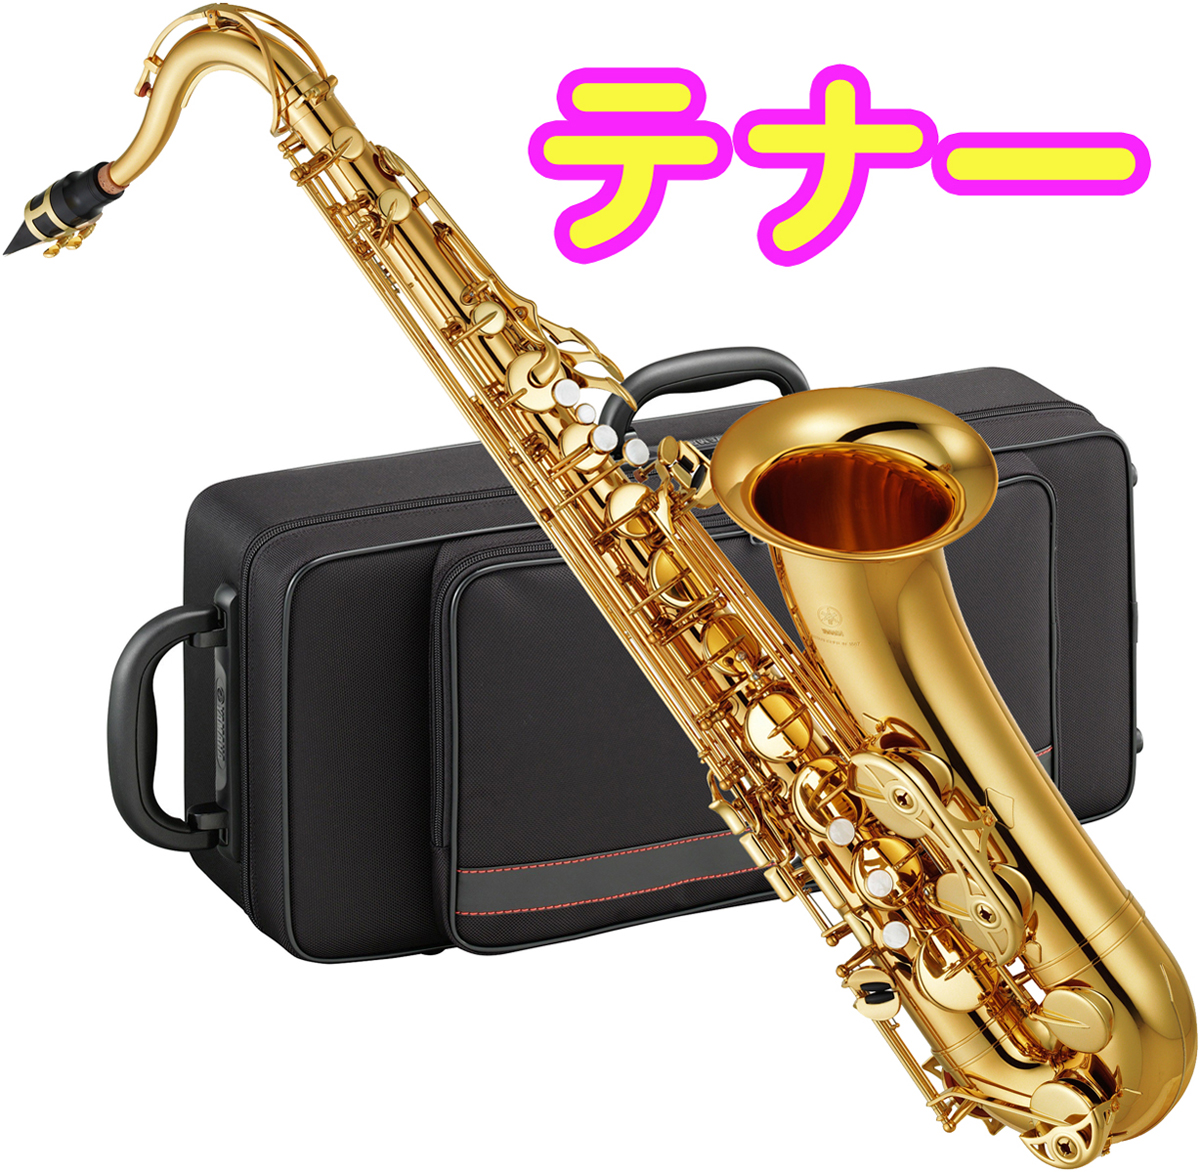 YAMAHA ( ヤマハ ) テナーサックス YTS-380 新品 サックス 管体 ゴールドラッカー 管楽器 管体 本体 テナーサクソフォン 楽器 送料無料